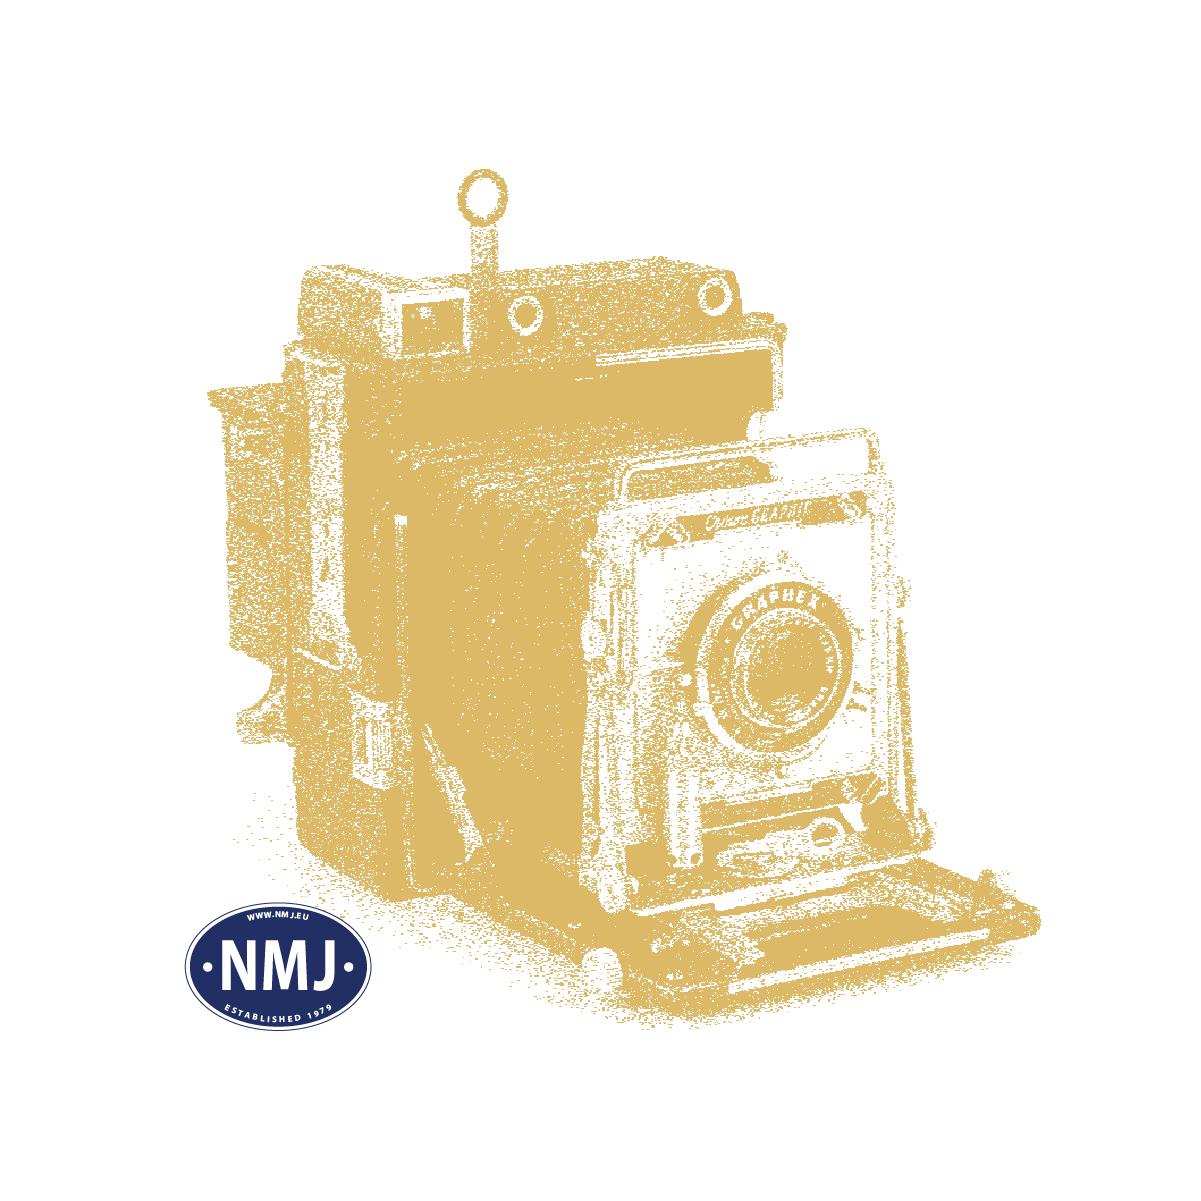 NMJS30b357 - NMJ Superline NSB Type 30b 357